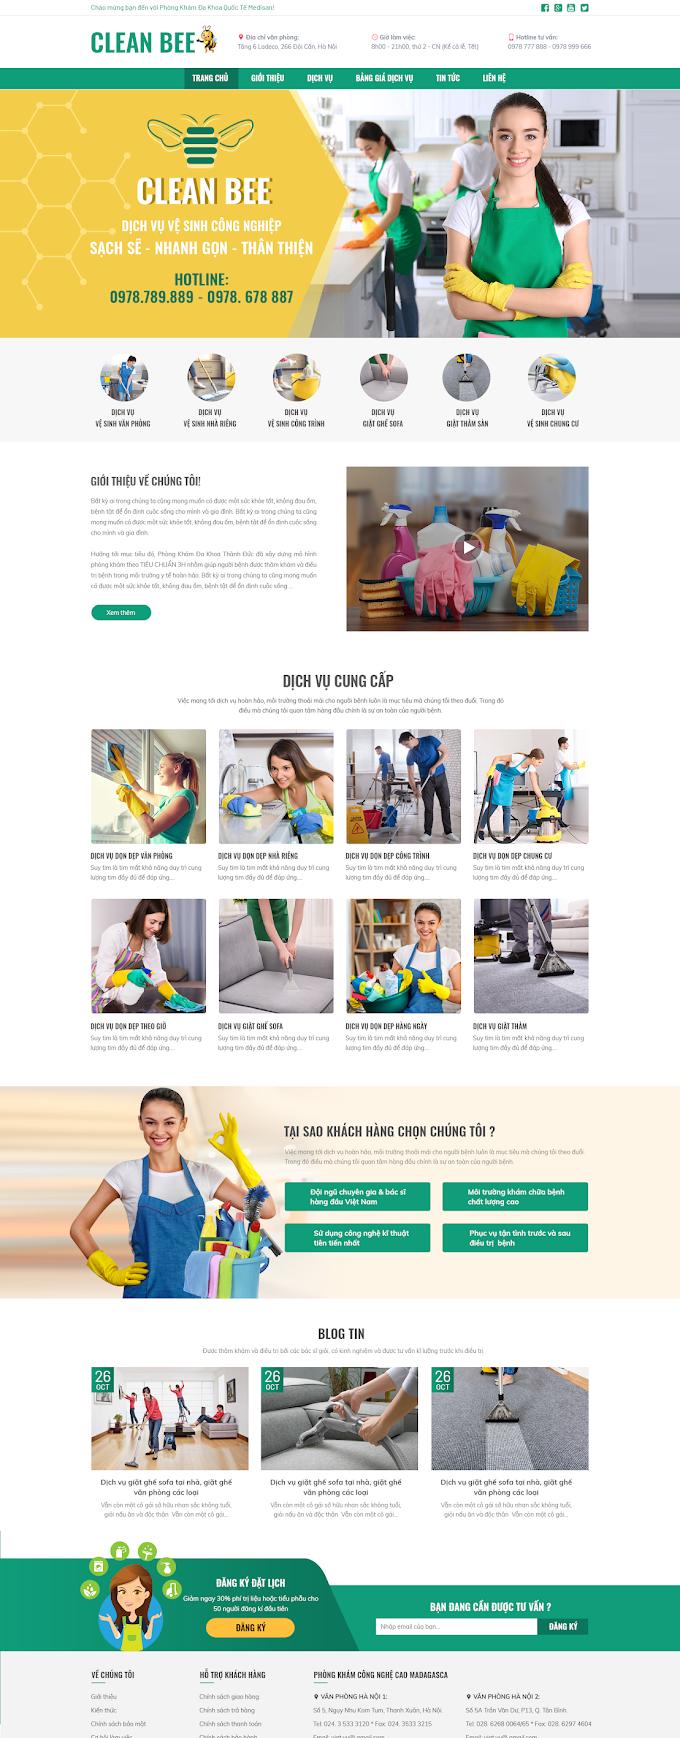 Mẫu website dịch vụ vệ sinh 2020